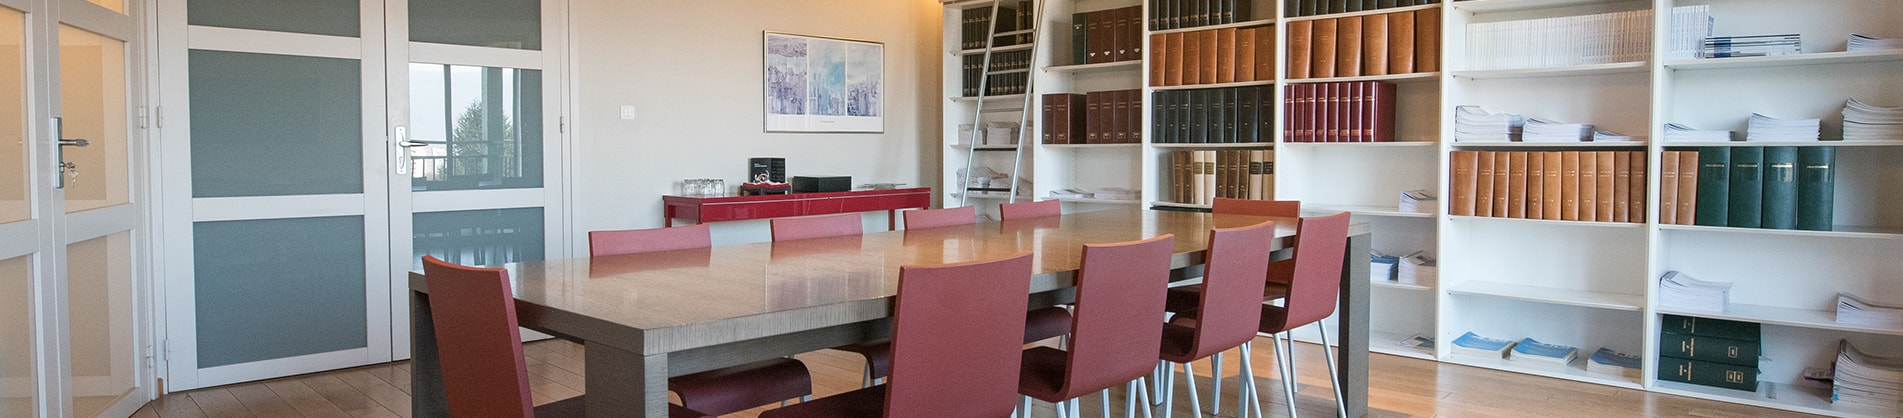 Cabinet d 39 avocats associ s toulouse clamens conseil - Cabinet de conseil toulouse ...